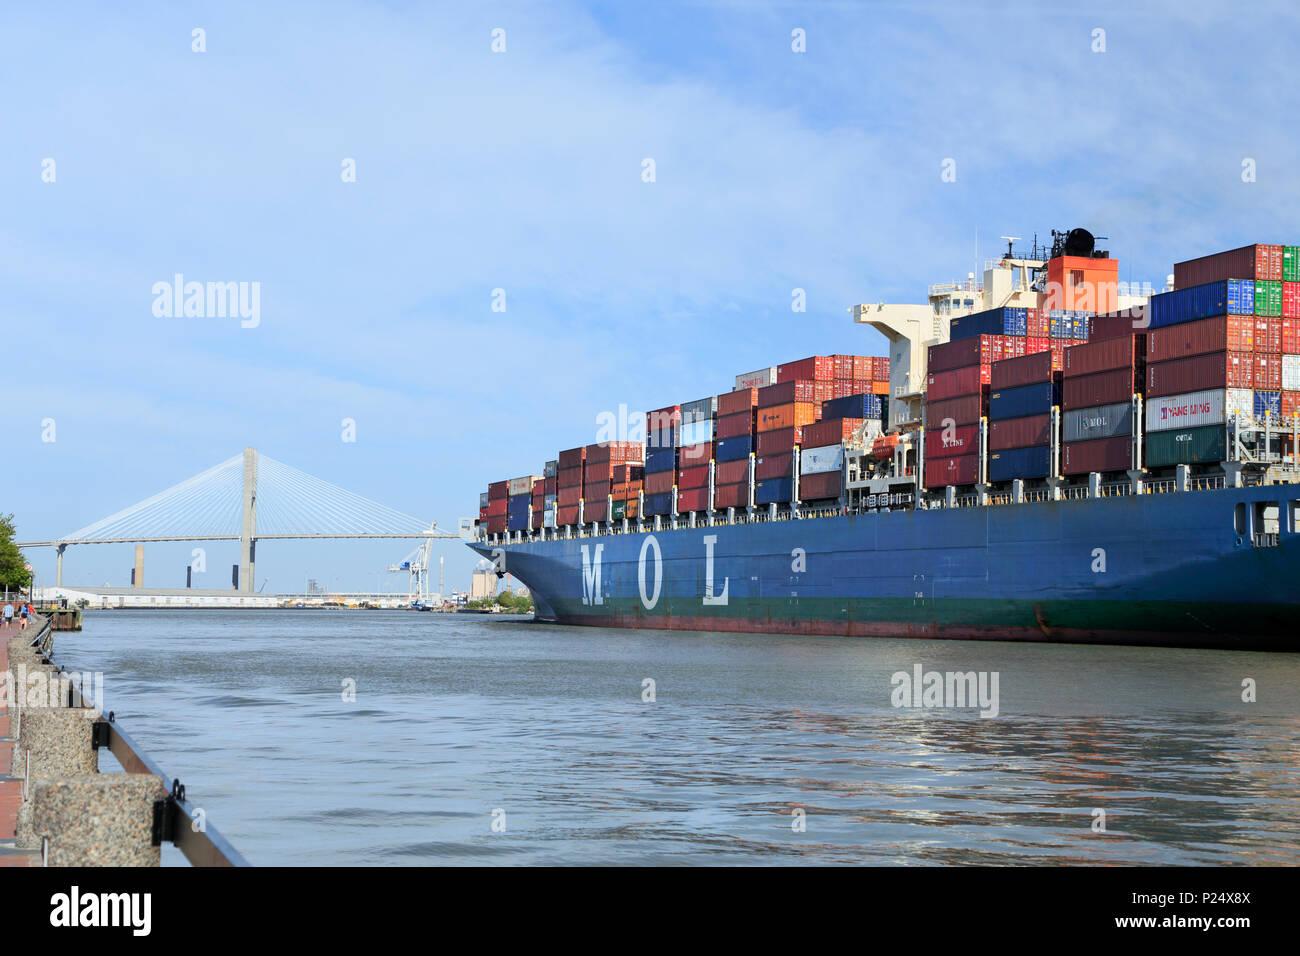 Savannah, Georgia. The MOL Benefactor ship leaving the Port of Savannah under the Talmadge Memorial bridge. - Stock Image